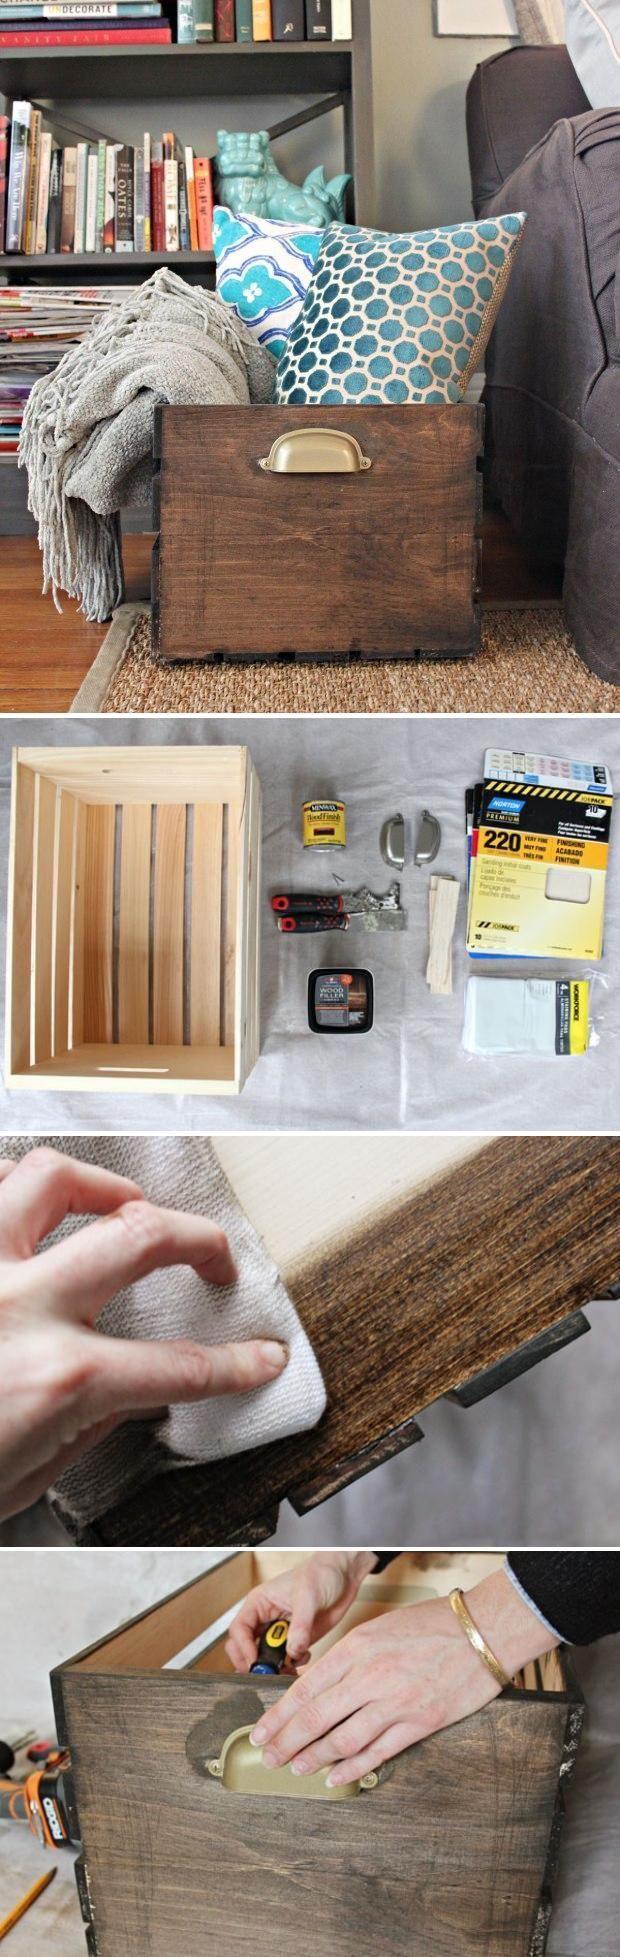 Best 25 blanket storage ideas on pinterest spare for Living room blanket storage